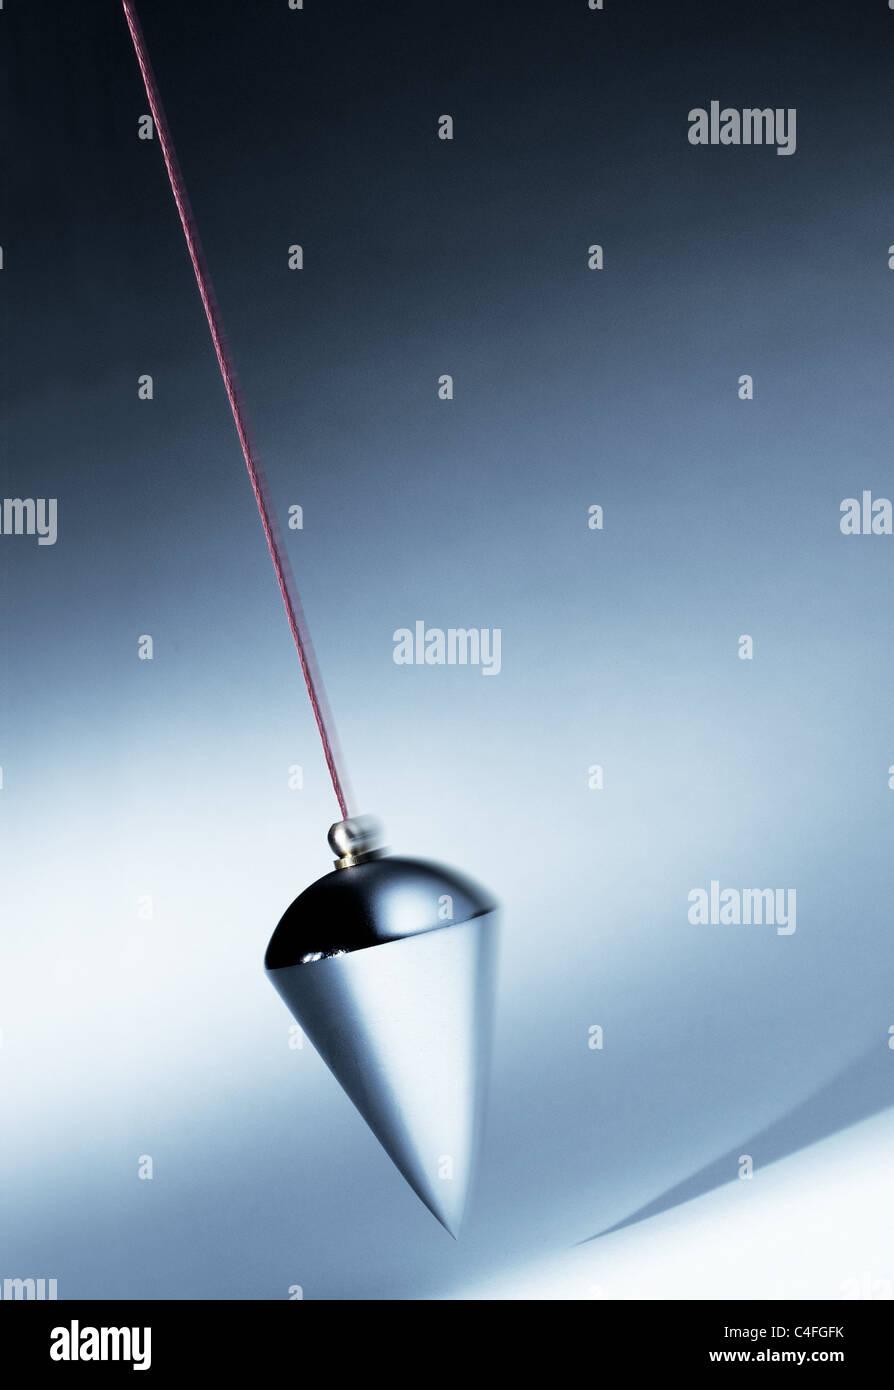 Pendulum - Stock Image